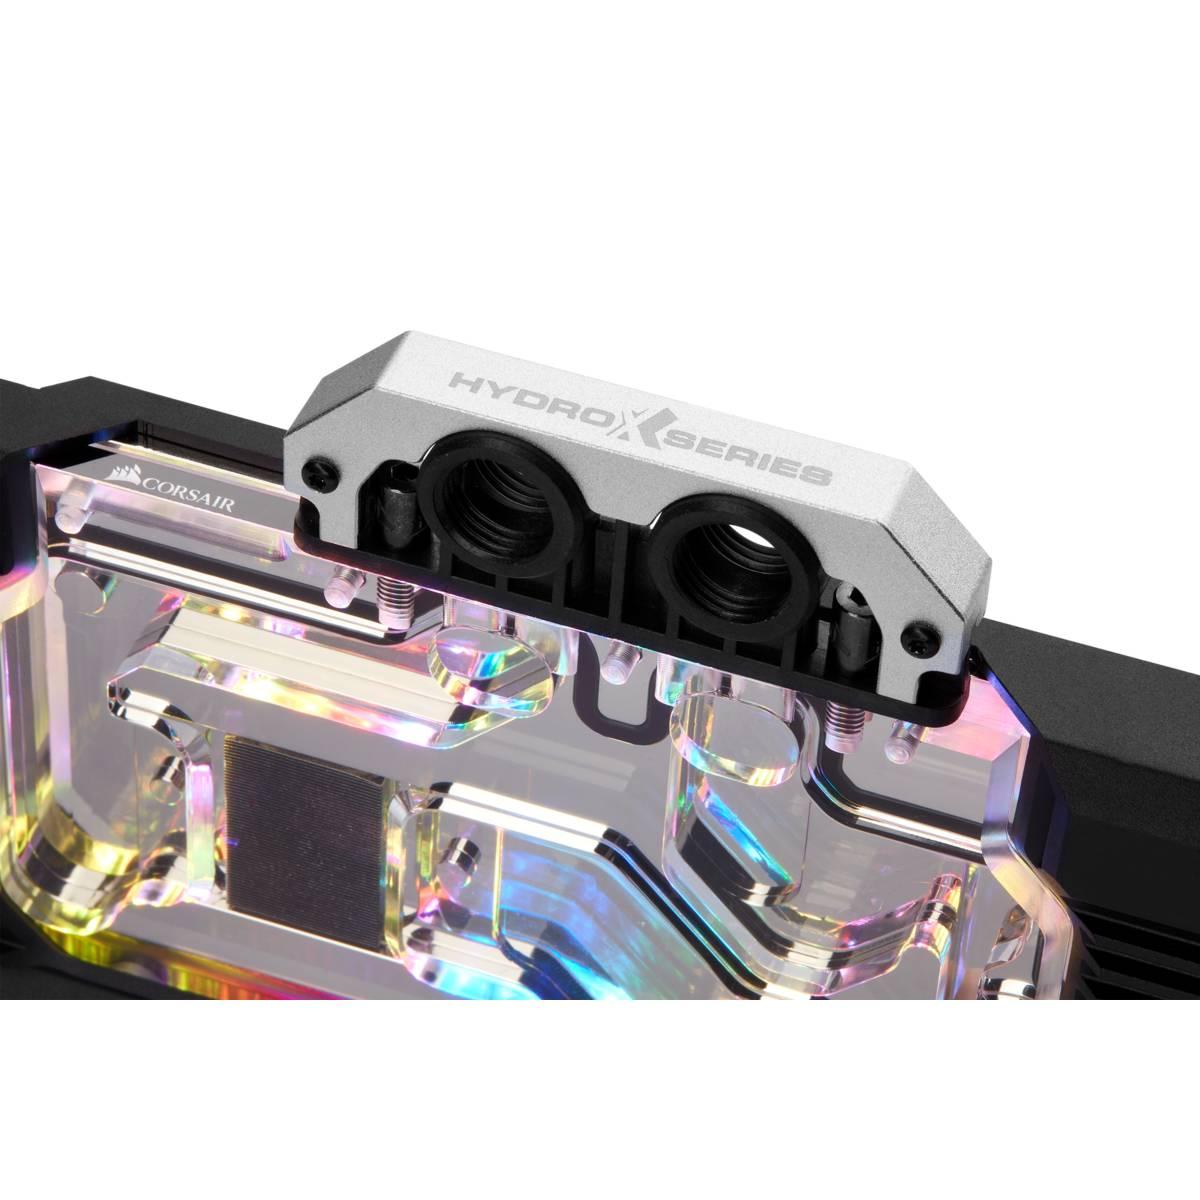 CORSAIR Hydro X Series XG7 RGB 20-SERIES GPU Water Block (2080 FE)